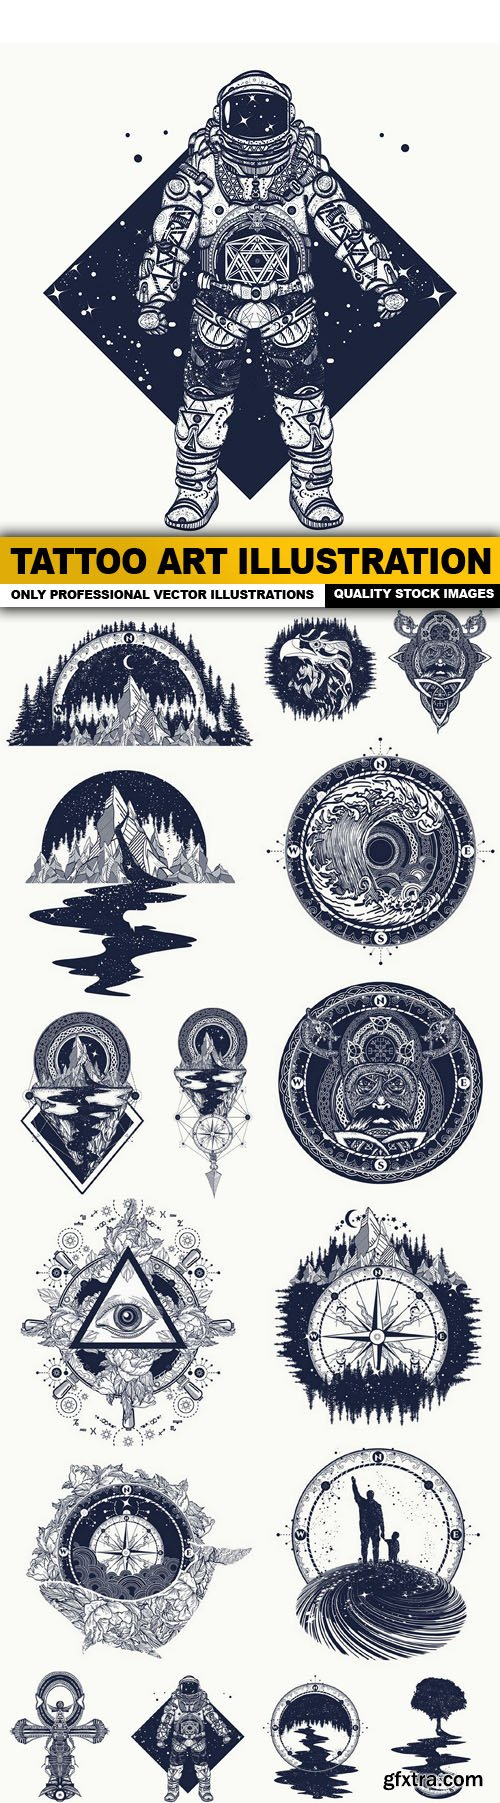 Tattoo Art Illustration - 16 Vector